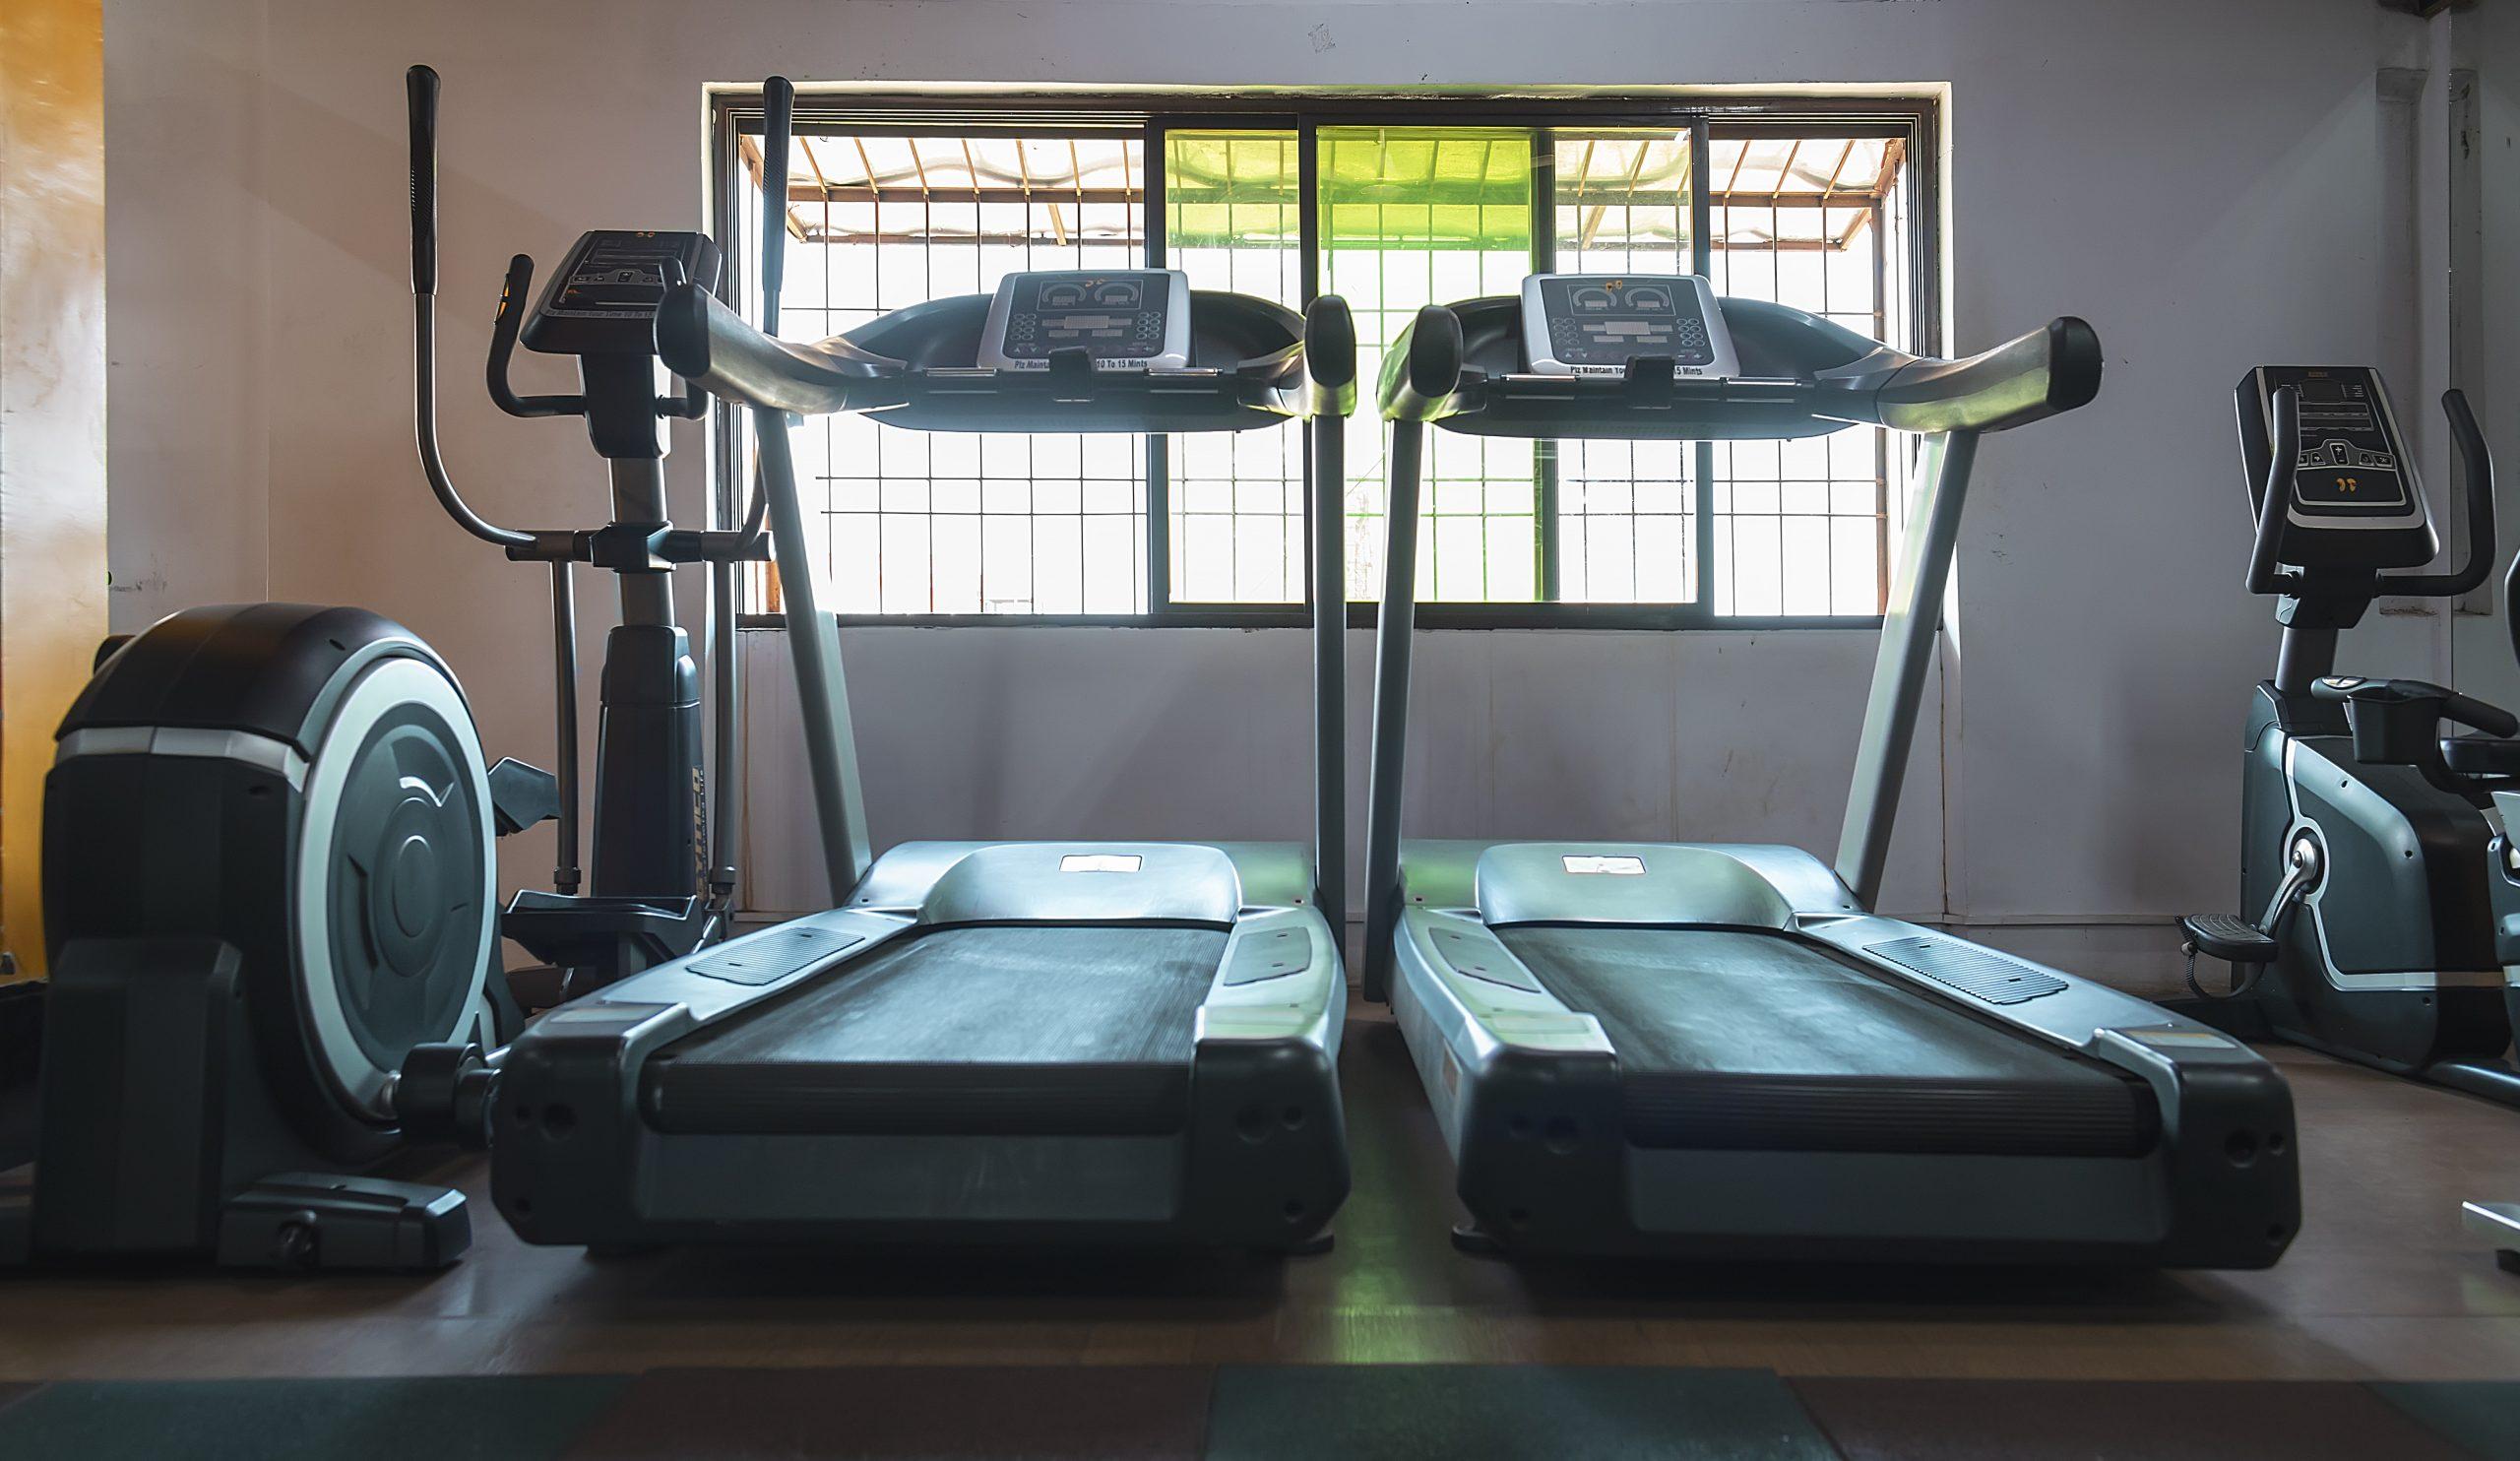 treadmill gym equipment